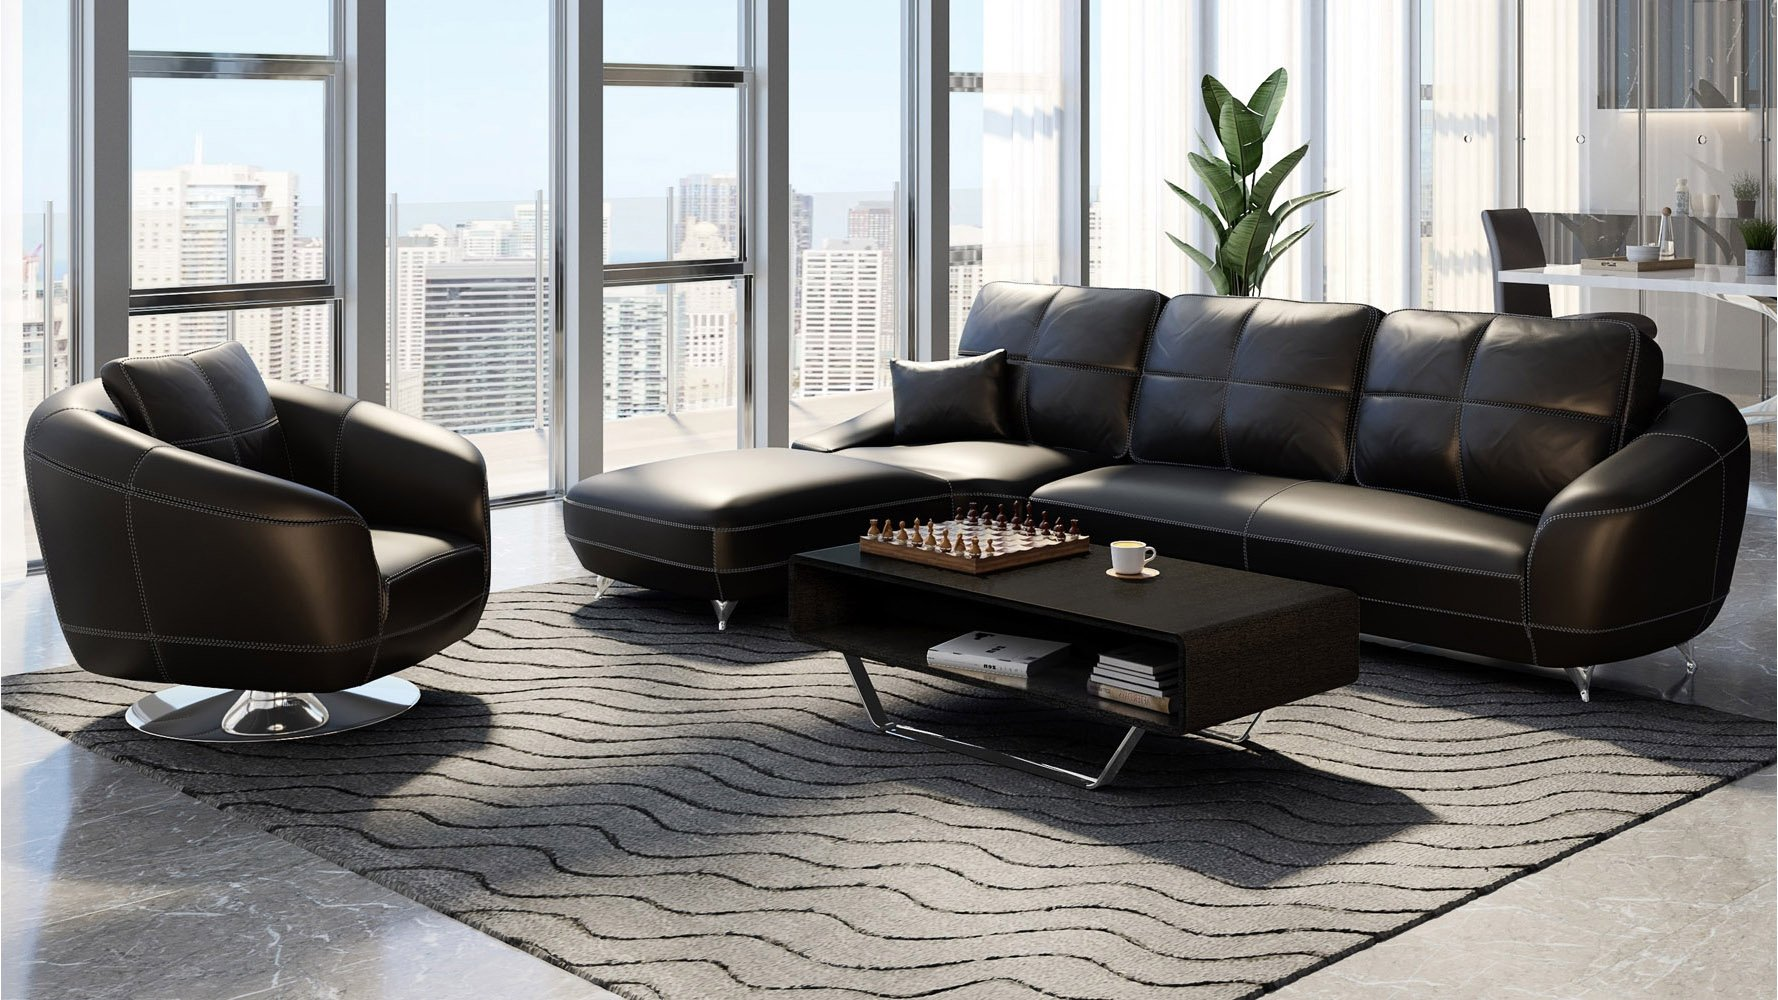 Beautiful furniture w